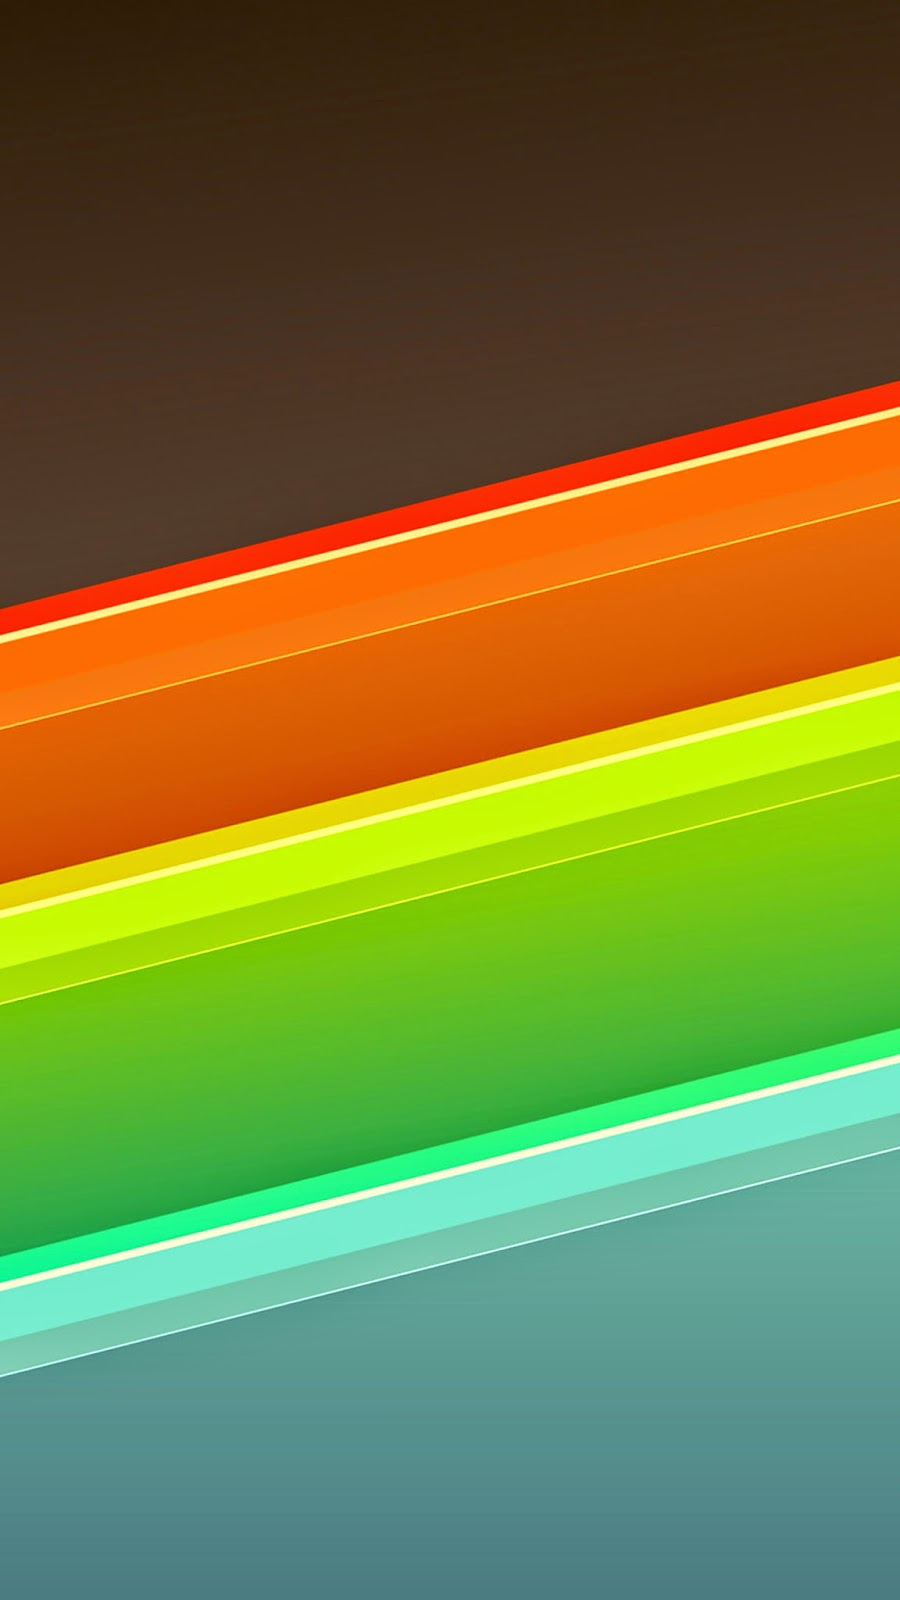 Samsung Galaxy S6 HD Wallpapers